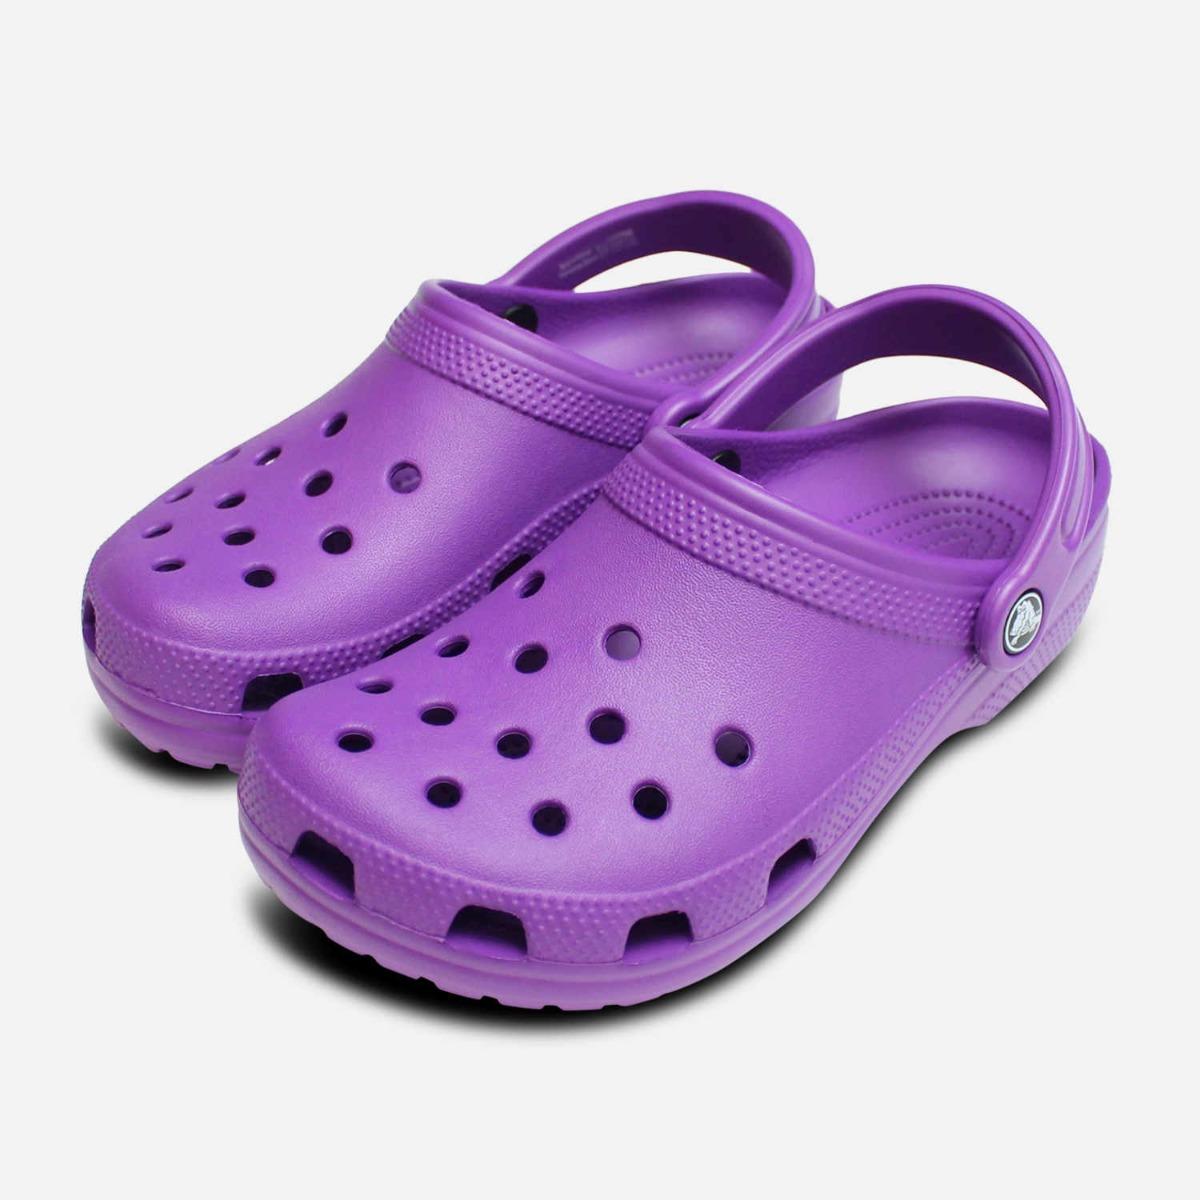 Crocs Womens Classic Clog in Neon